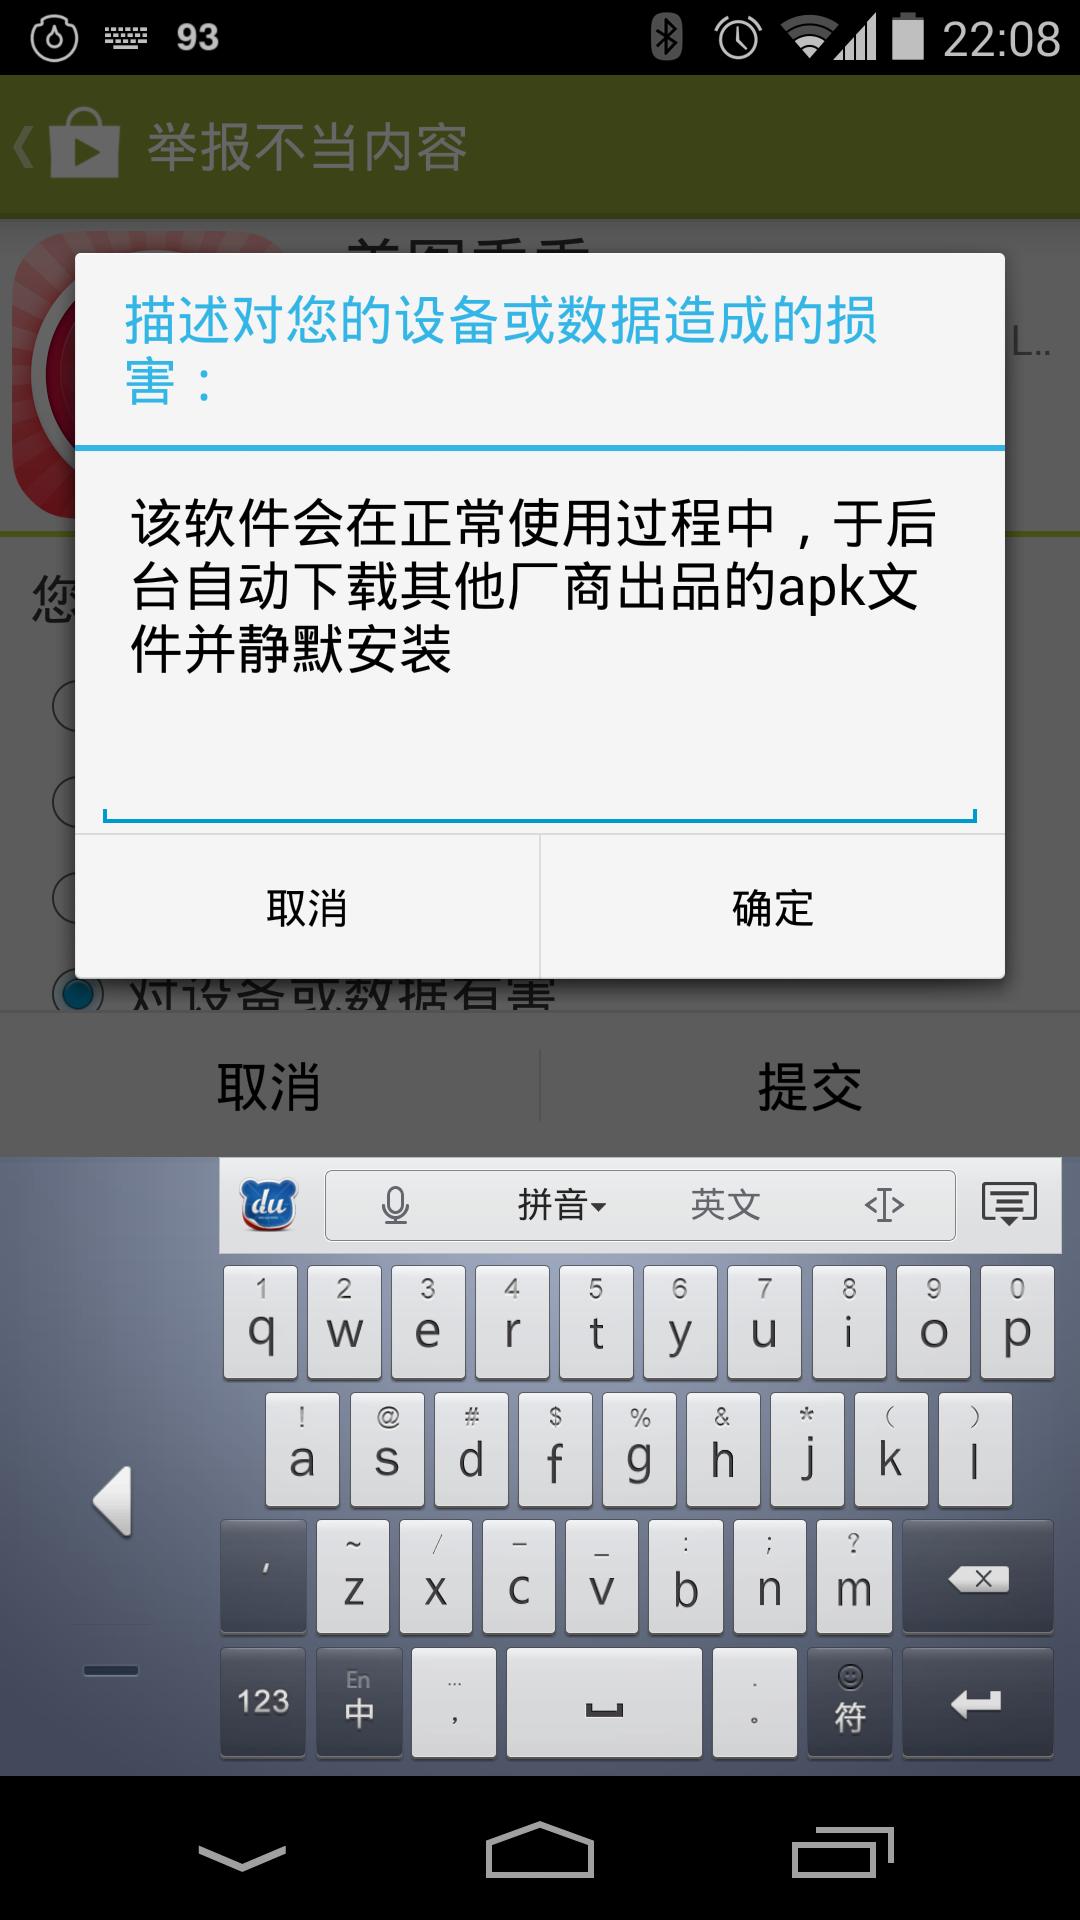 Screenshot_2014-03-23-22-08-09